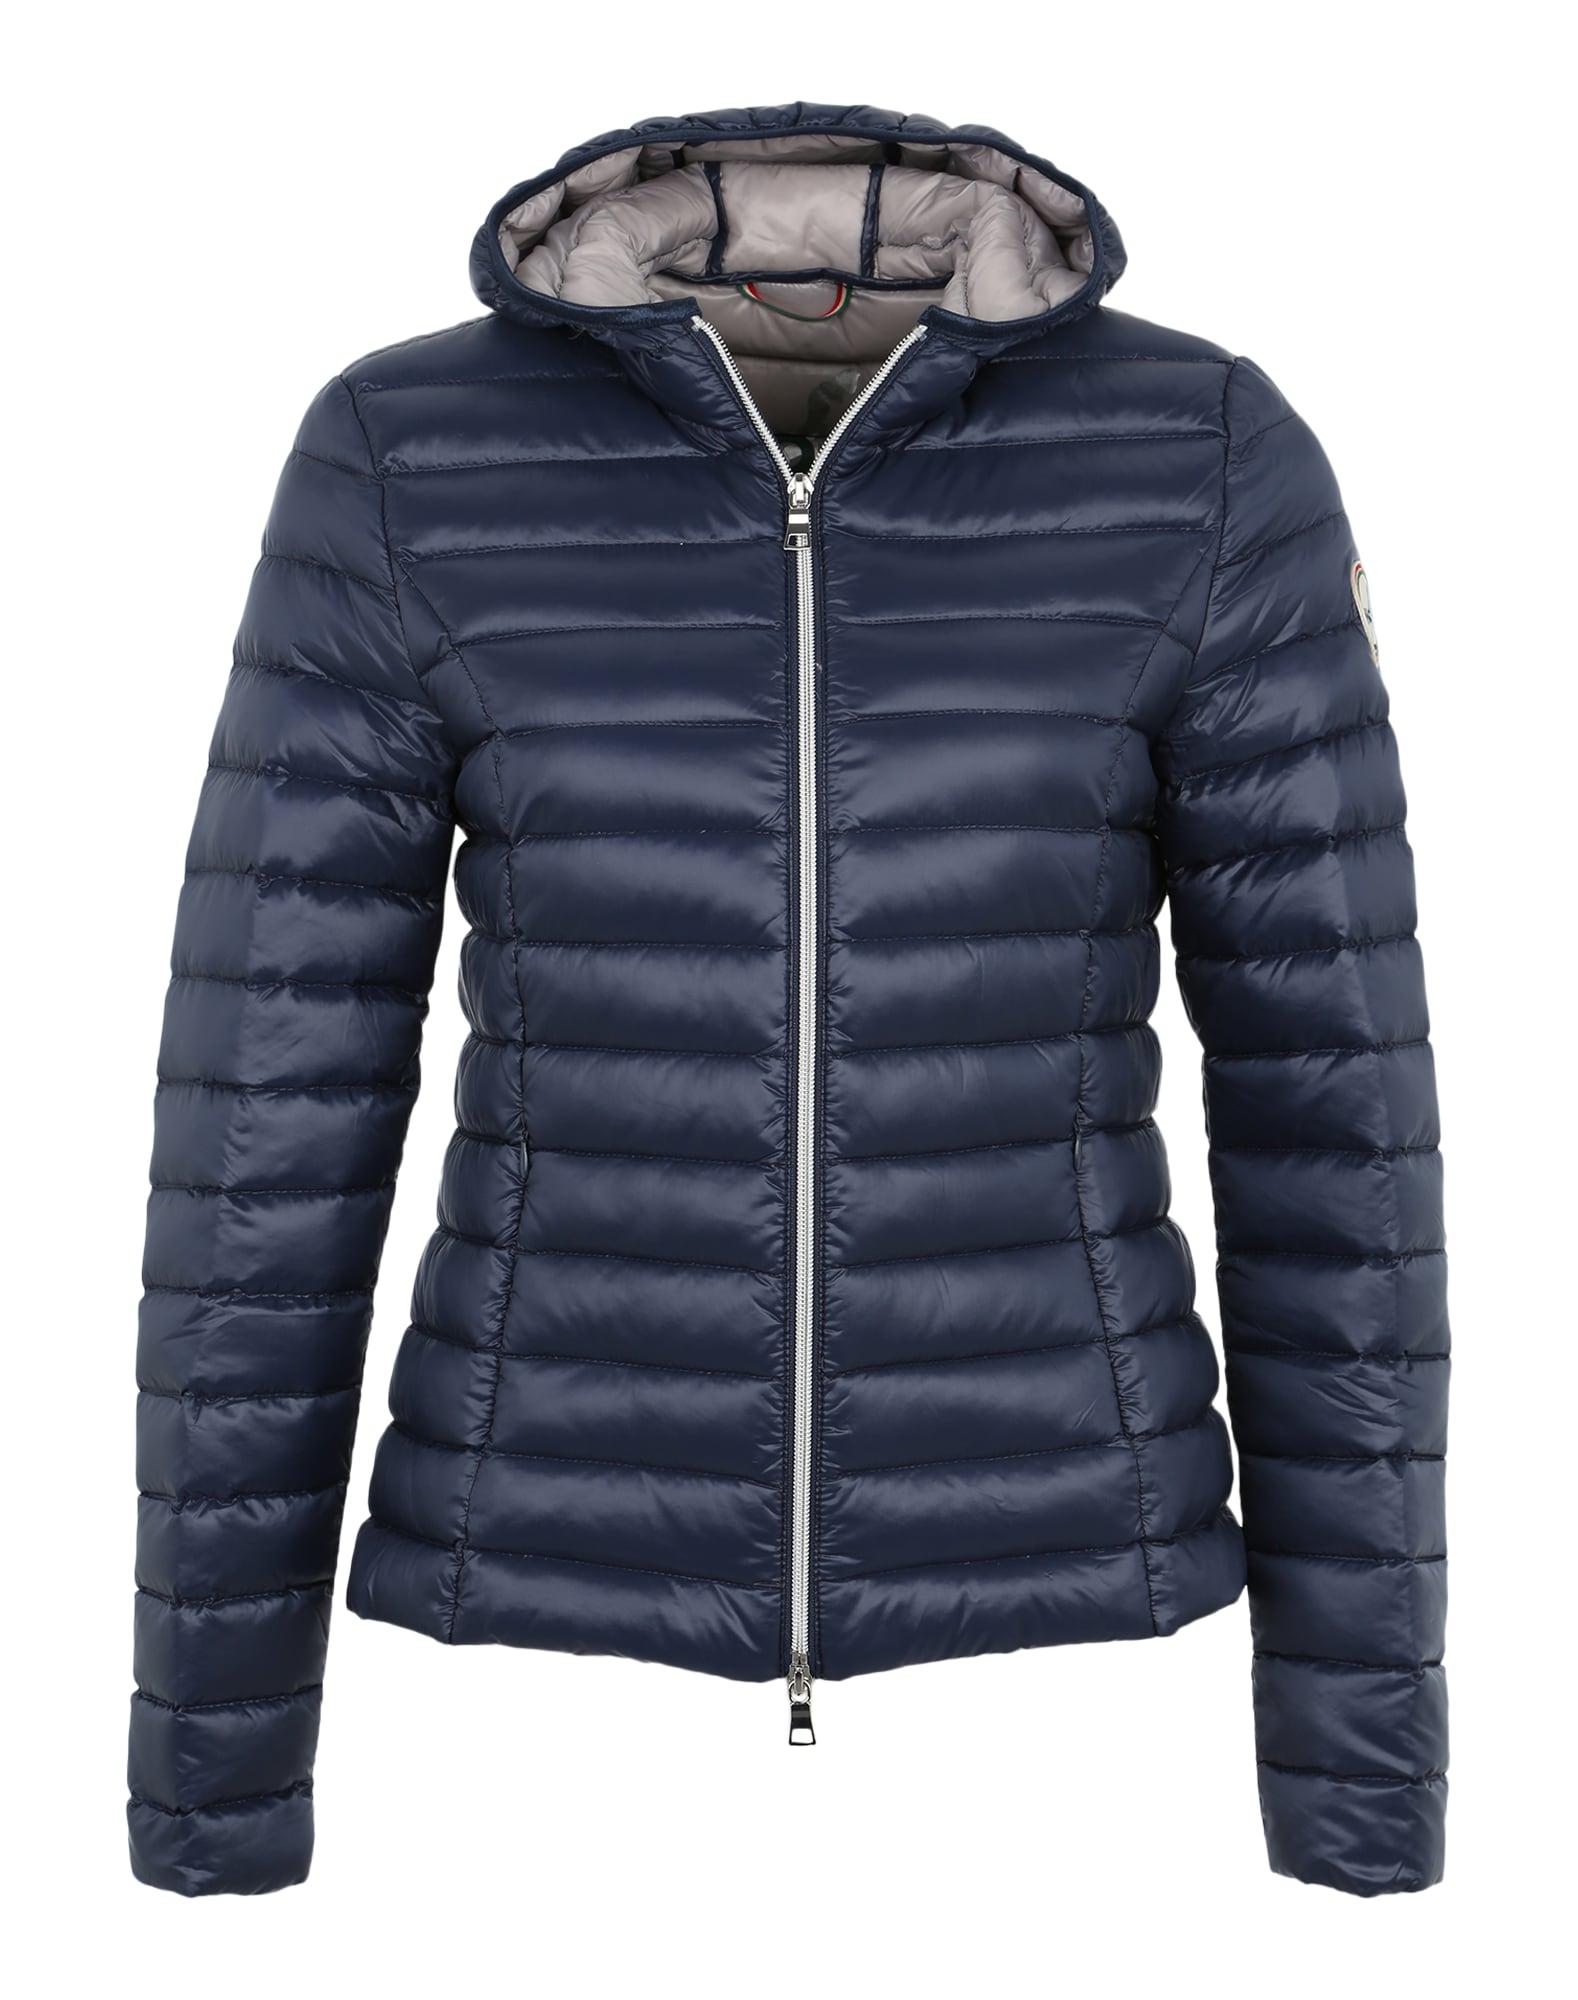 Zimní bunda Forte tmavě modrá No. 1 Como